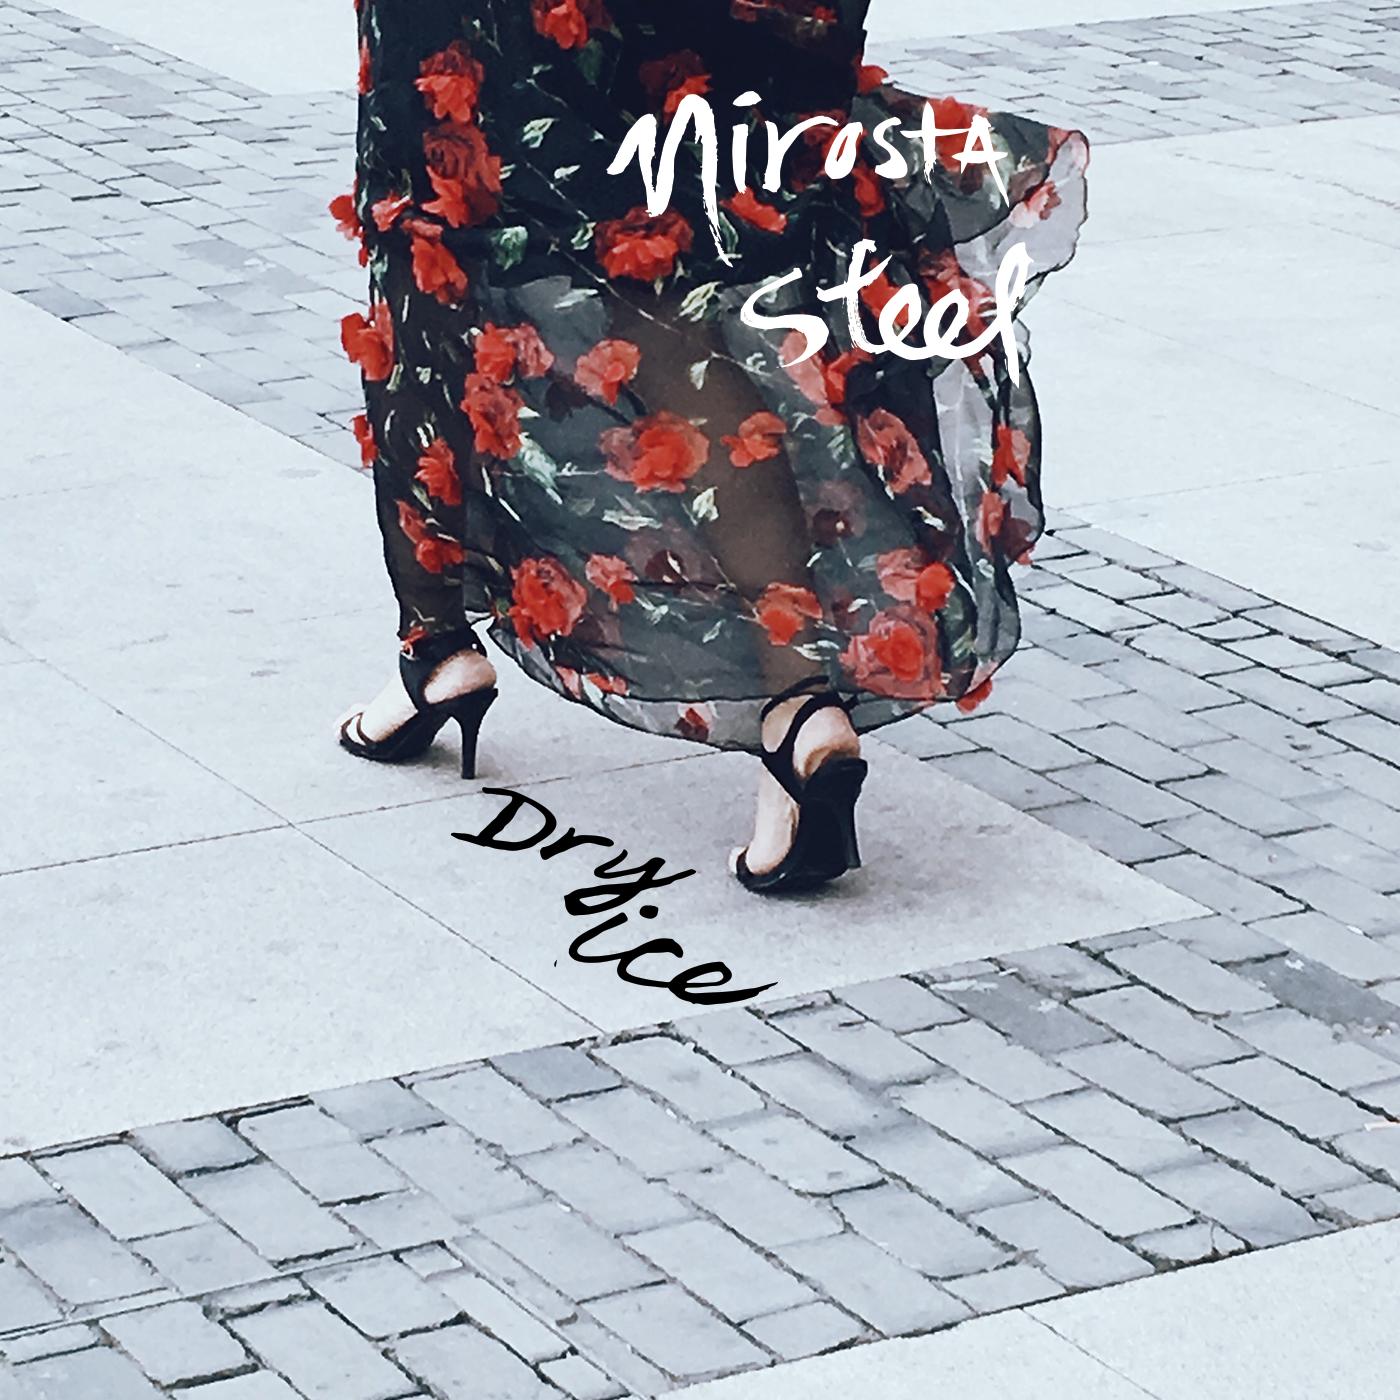 Nirosta Steel -